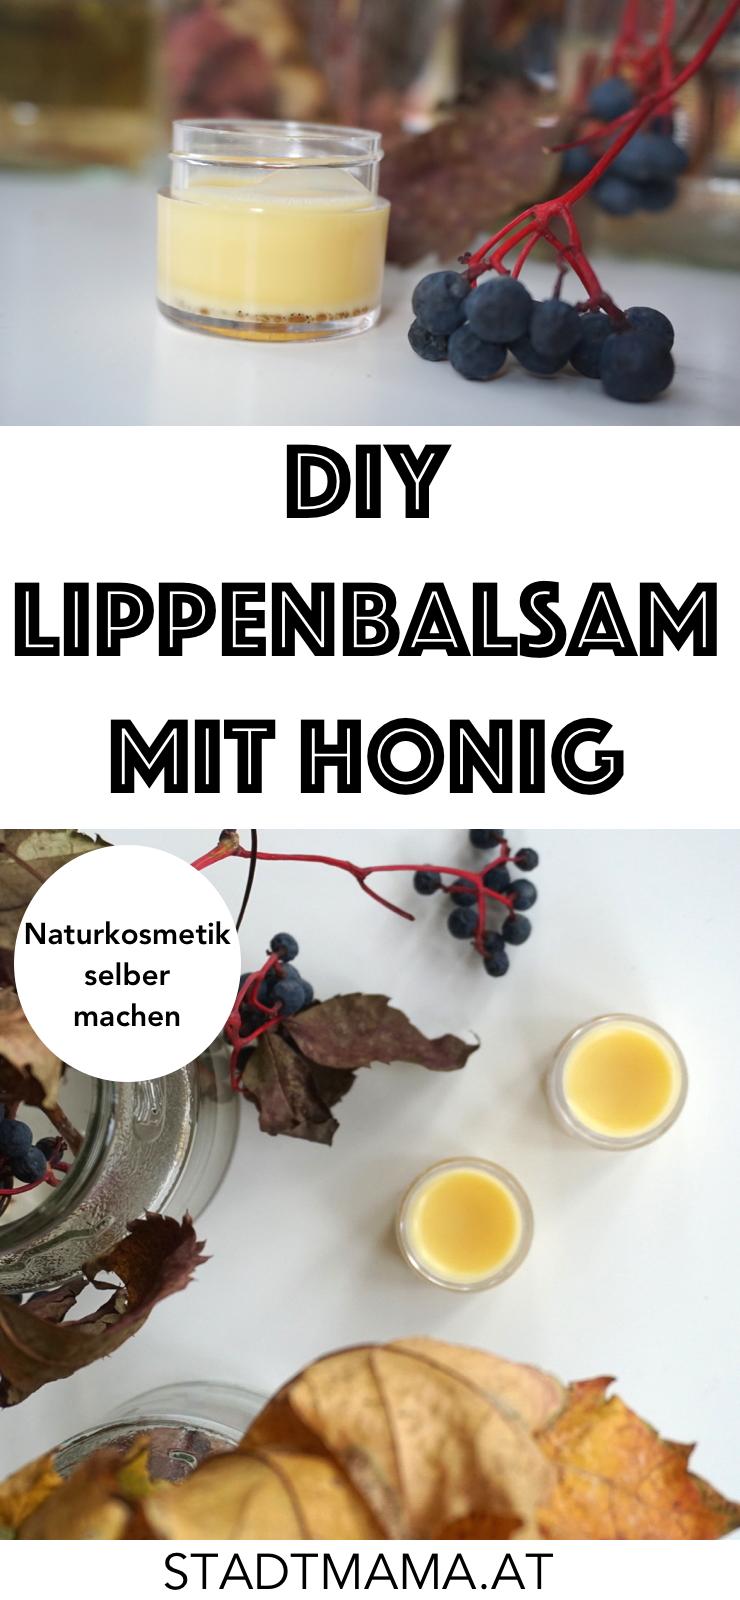 Photo of Natural cosmetics Make lip balm yourself – Stadtmama.at